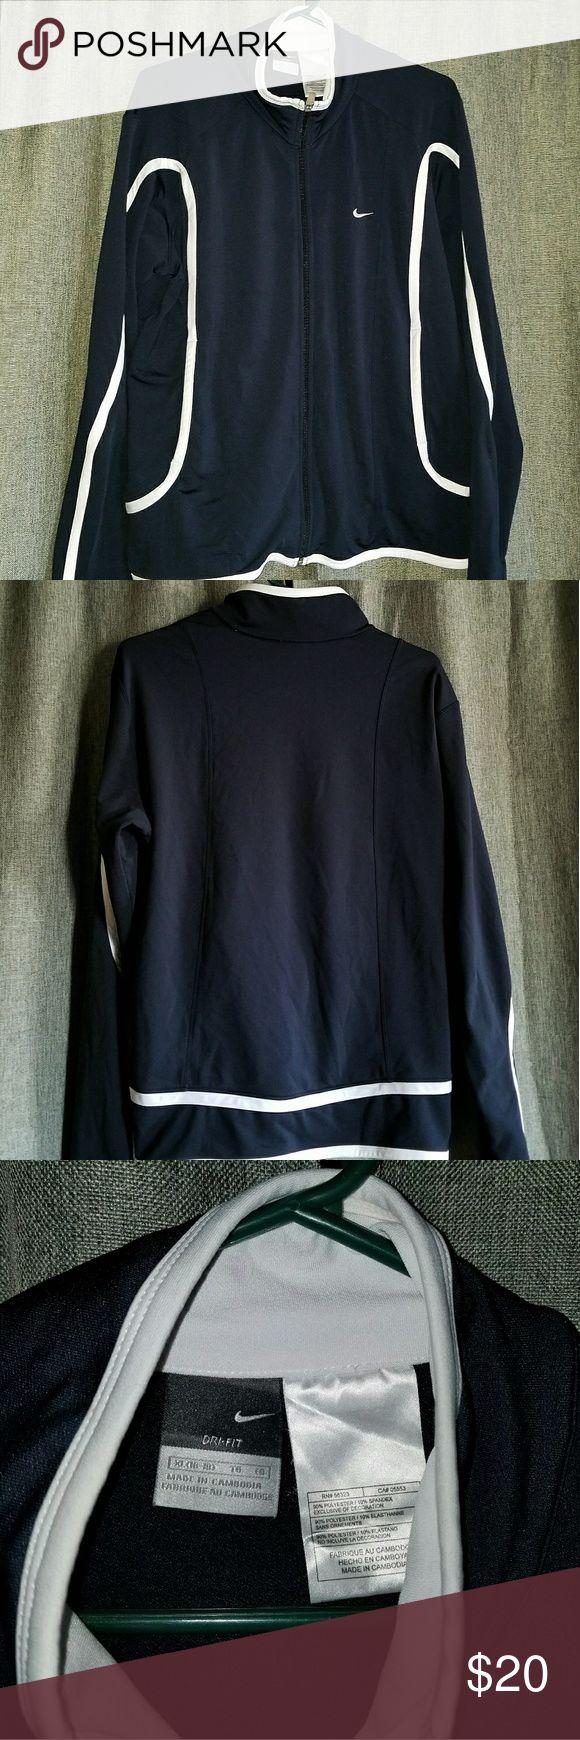 Nike women's dri-fit lightweight jacket Nike Women's dri-fit lightweight jacket zip-up jacket, dark blue and white. SIZE XL 16-18 Nike Tops Sweatshirts & Hoodies